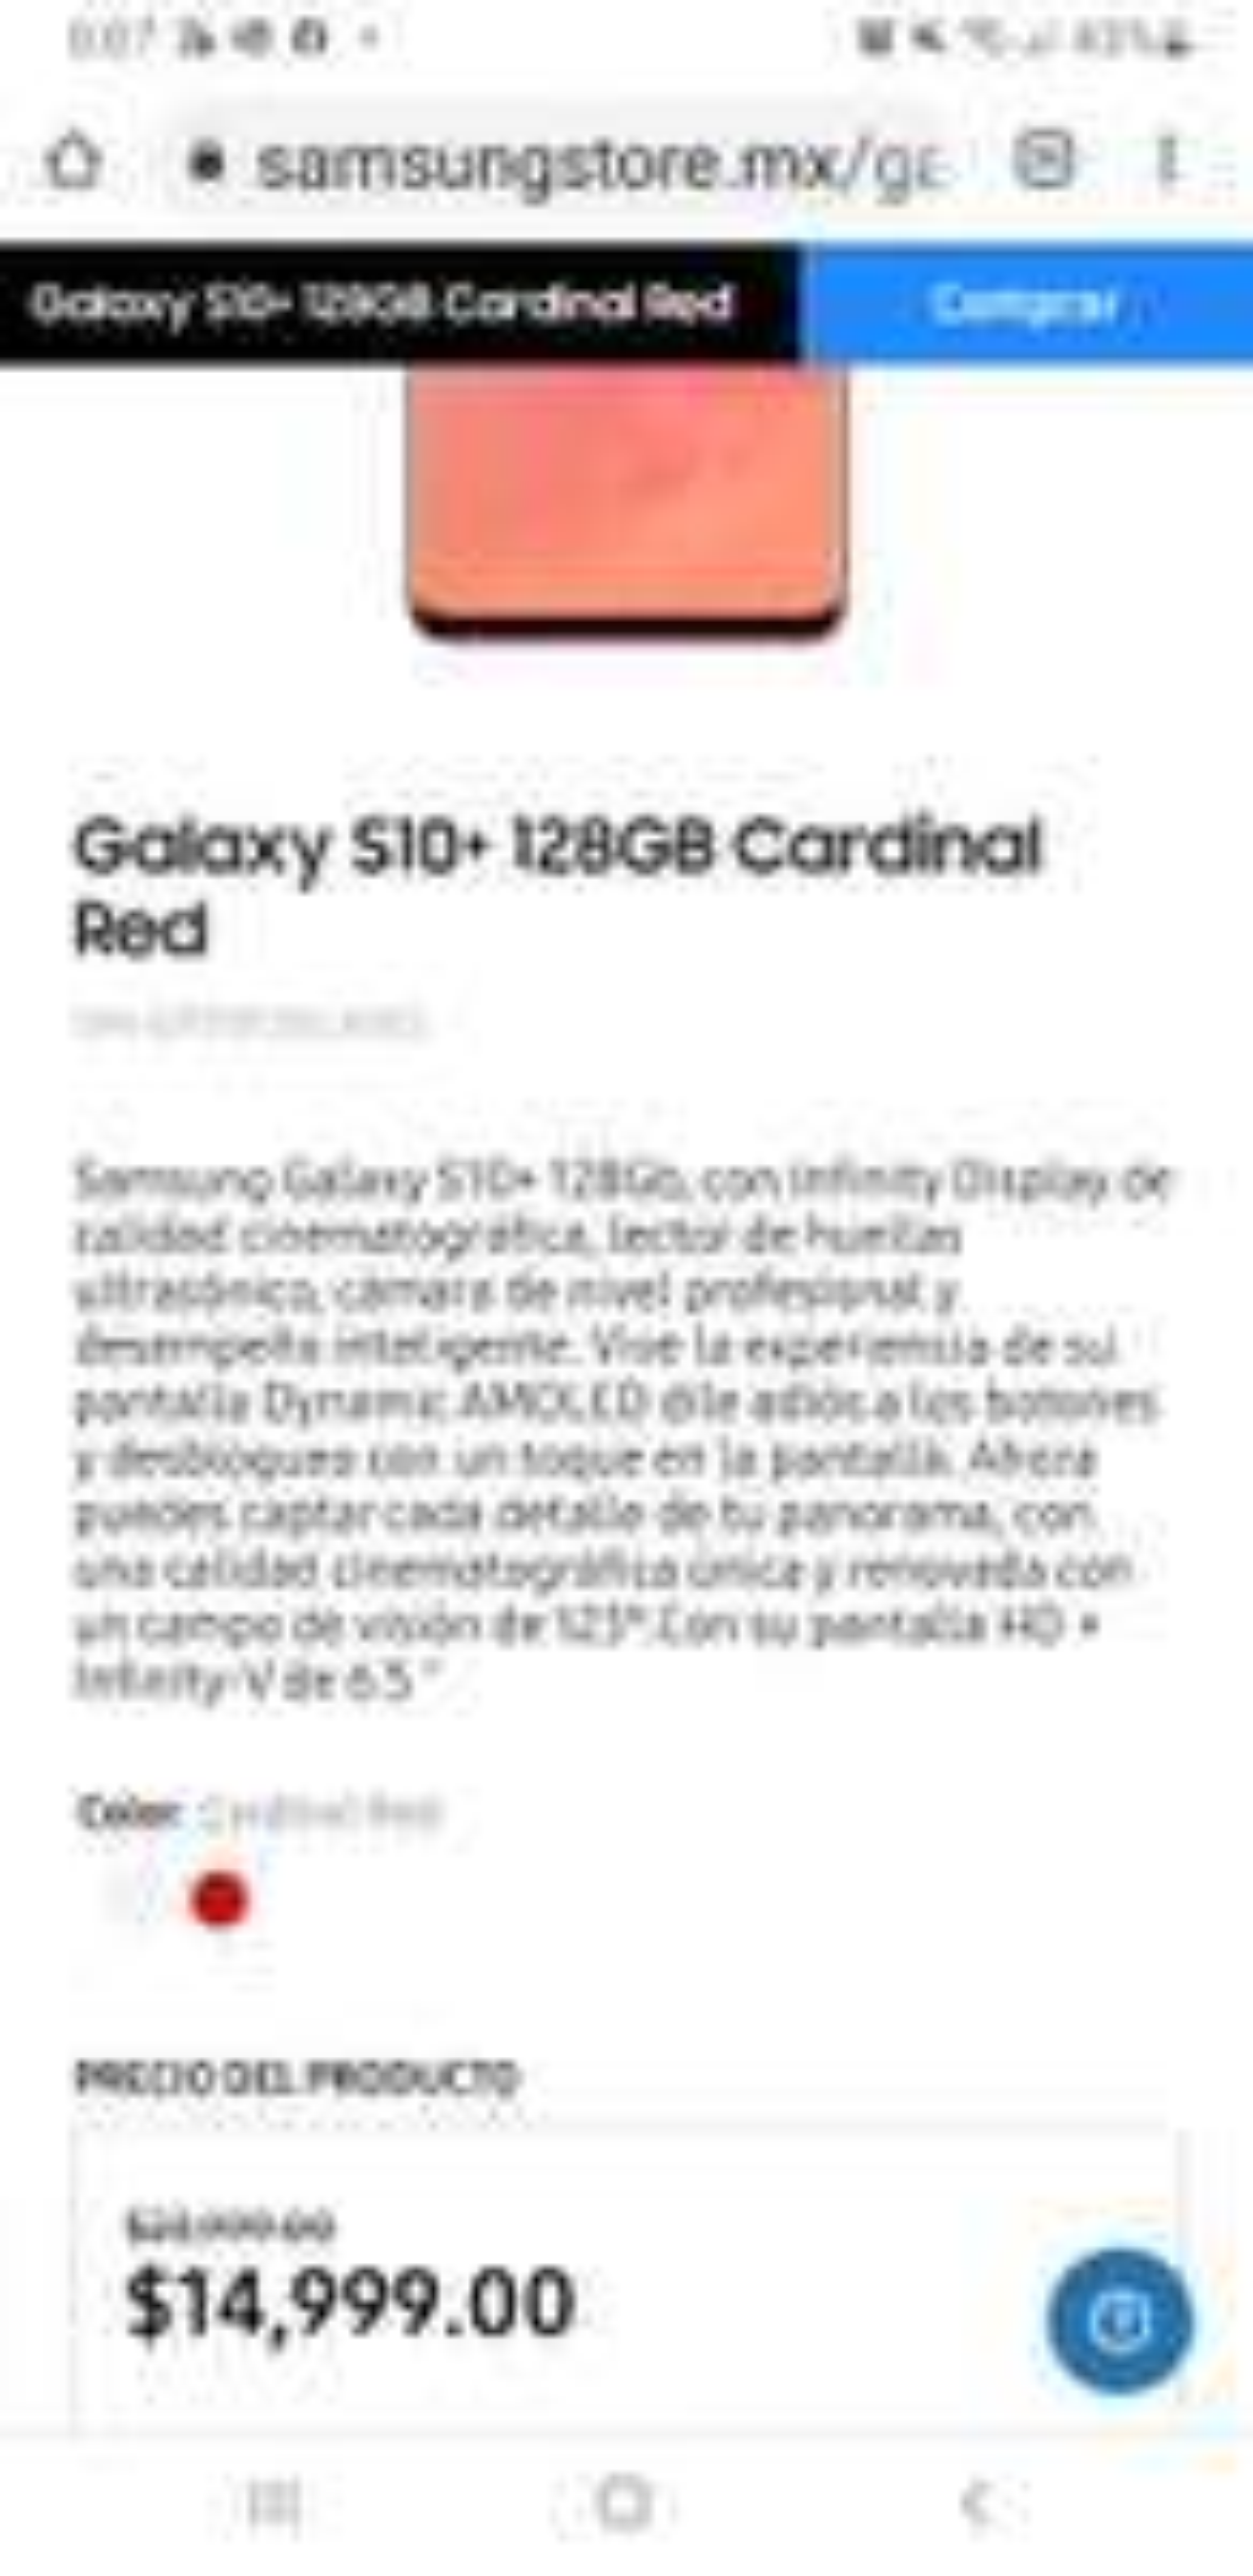 Samsung Store: Galaxy s10+ plus 128 gb